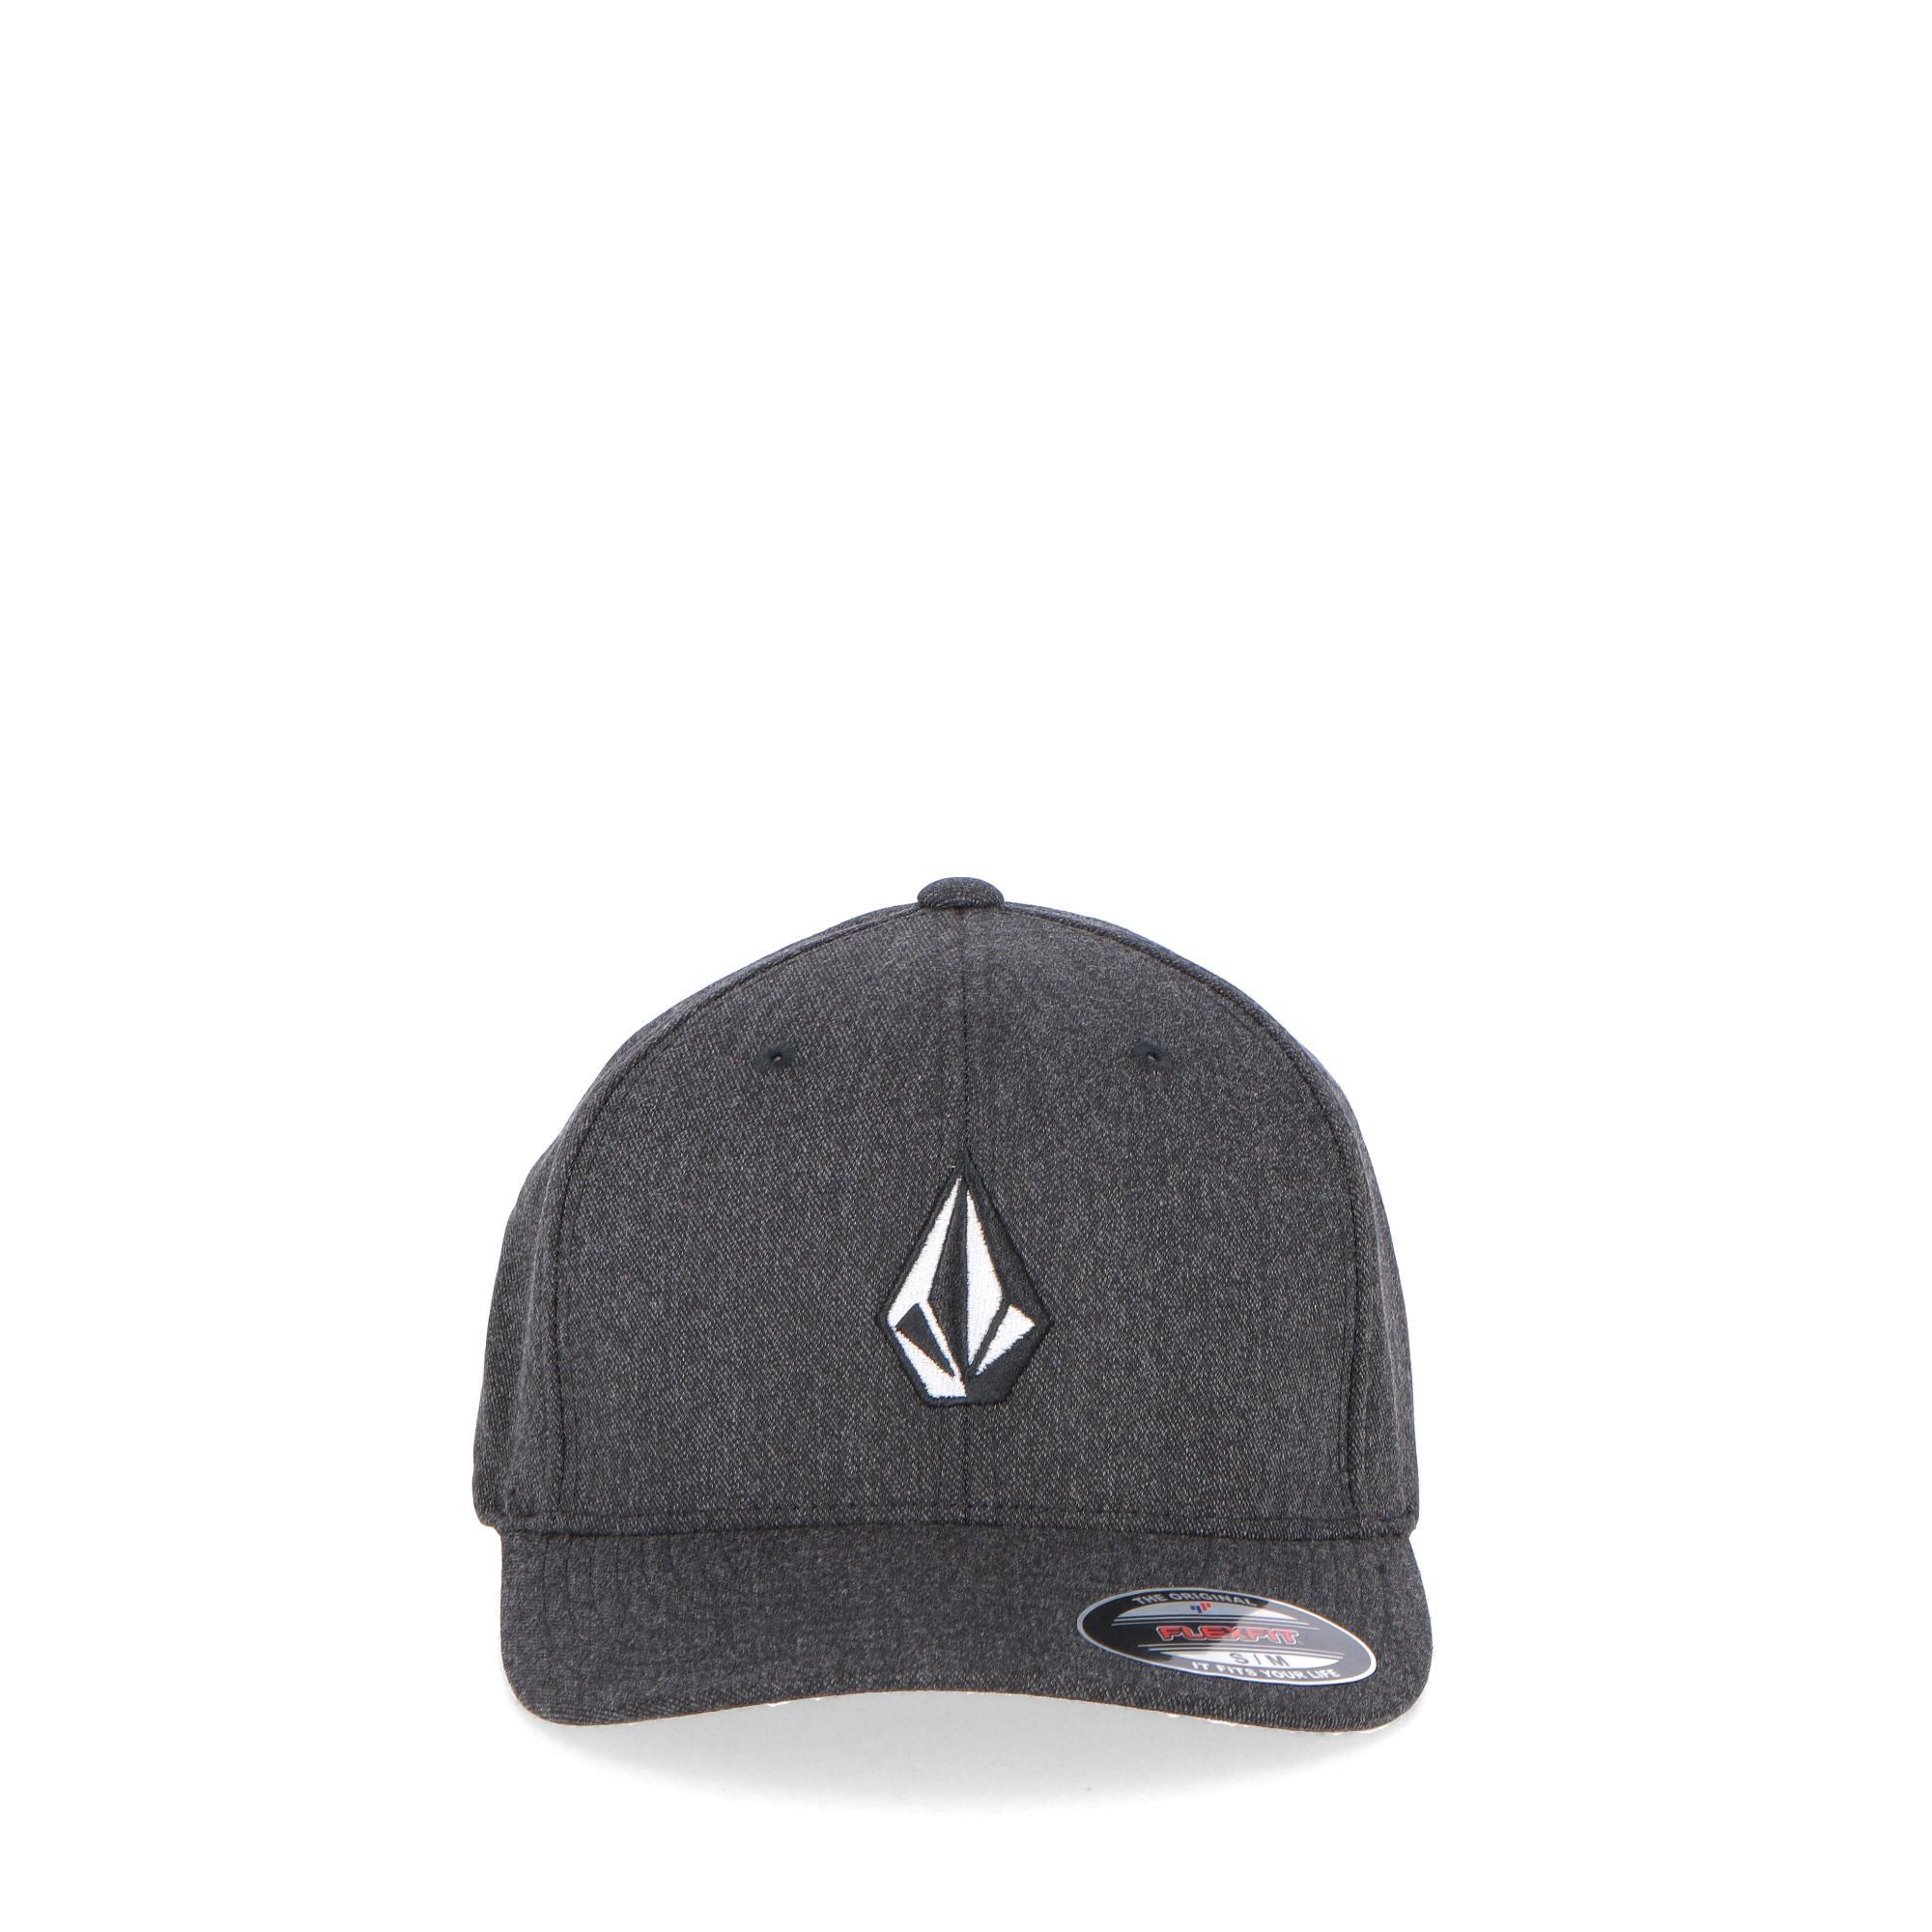 buy online 849ea 0c3d8 ... sweden volcom full stone heather xfit hat charcoal heather 094de c50ab